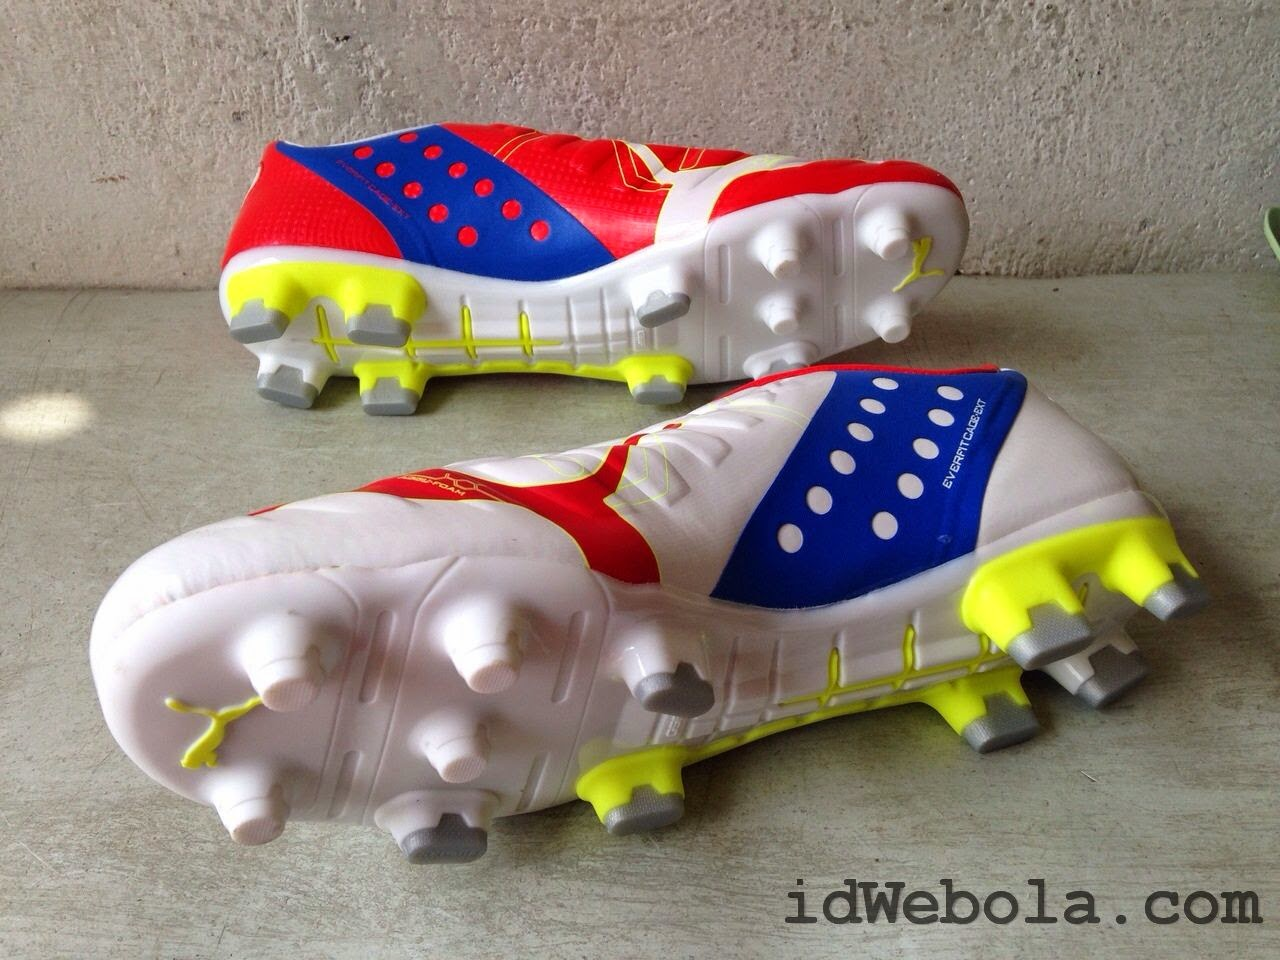 Sepatu Bola Puma Putih Merah